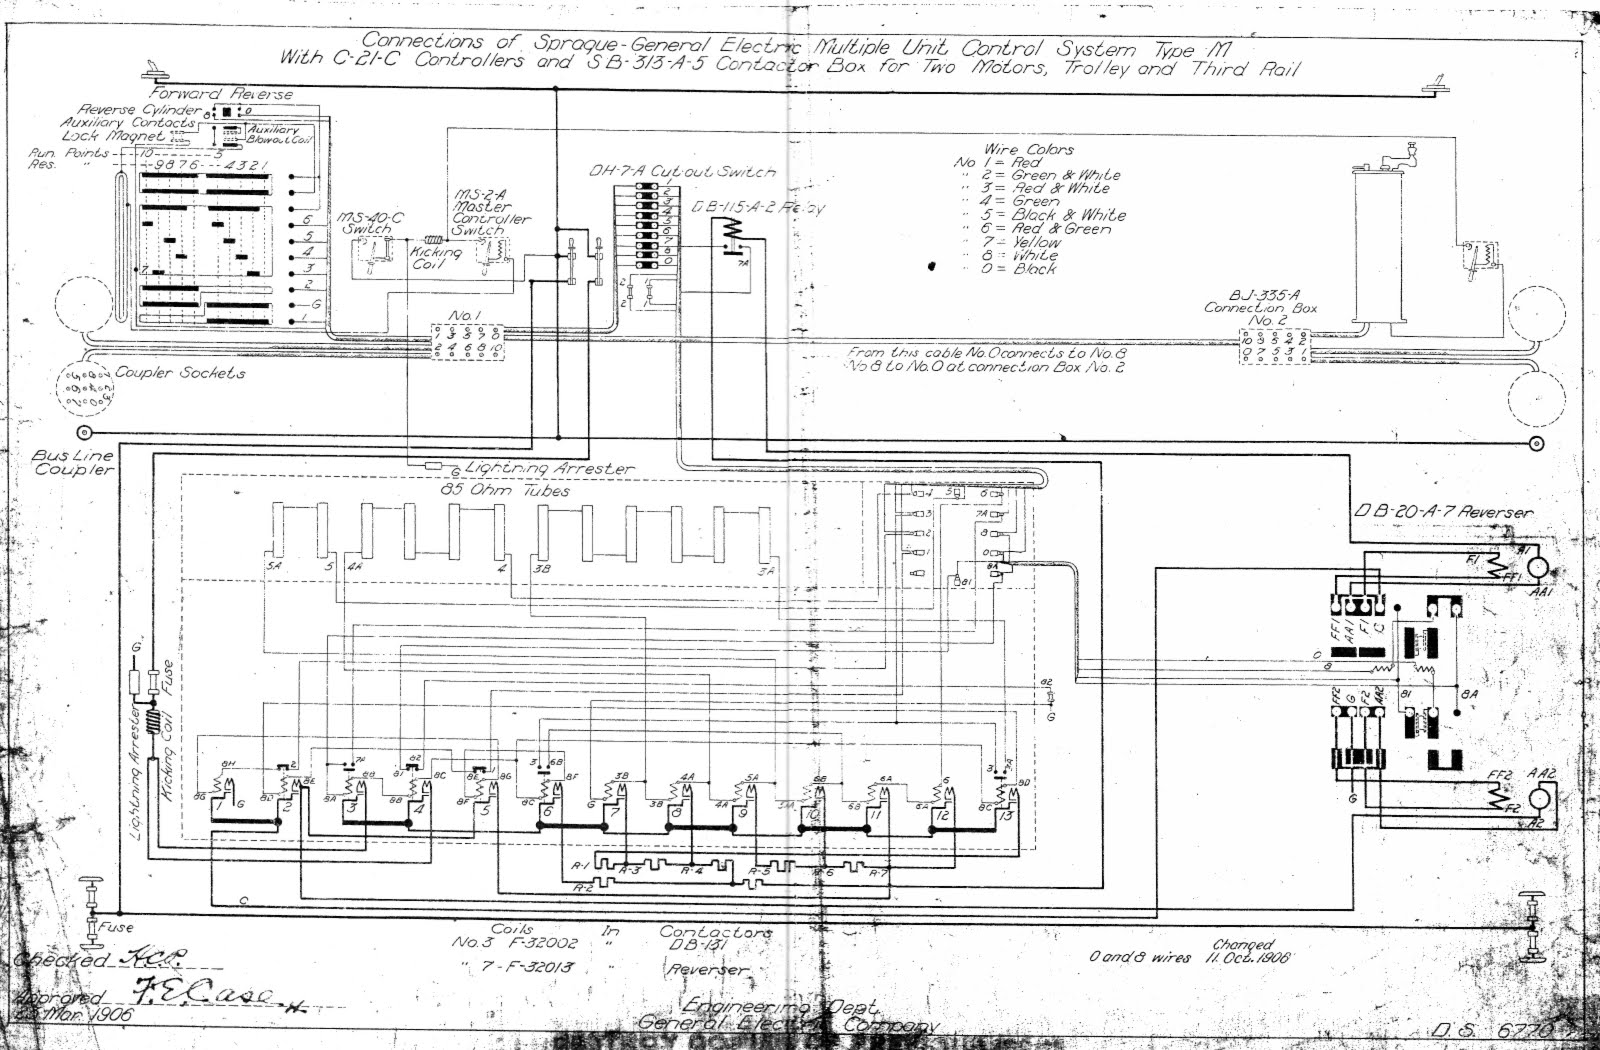 Tata+Nano+Electrical+Wiring+Diagram?t=1529656195 tata car manuals, wiring diagrams pdf & fault codes